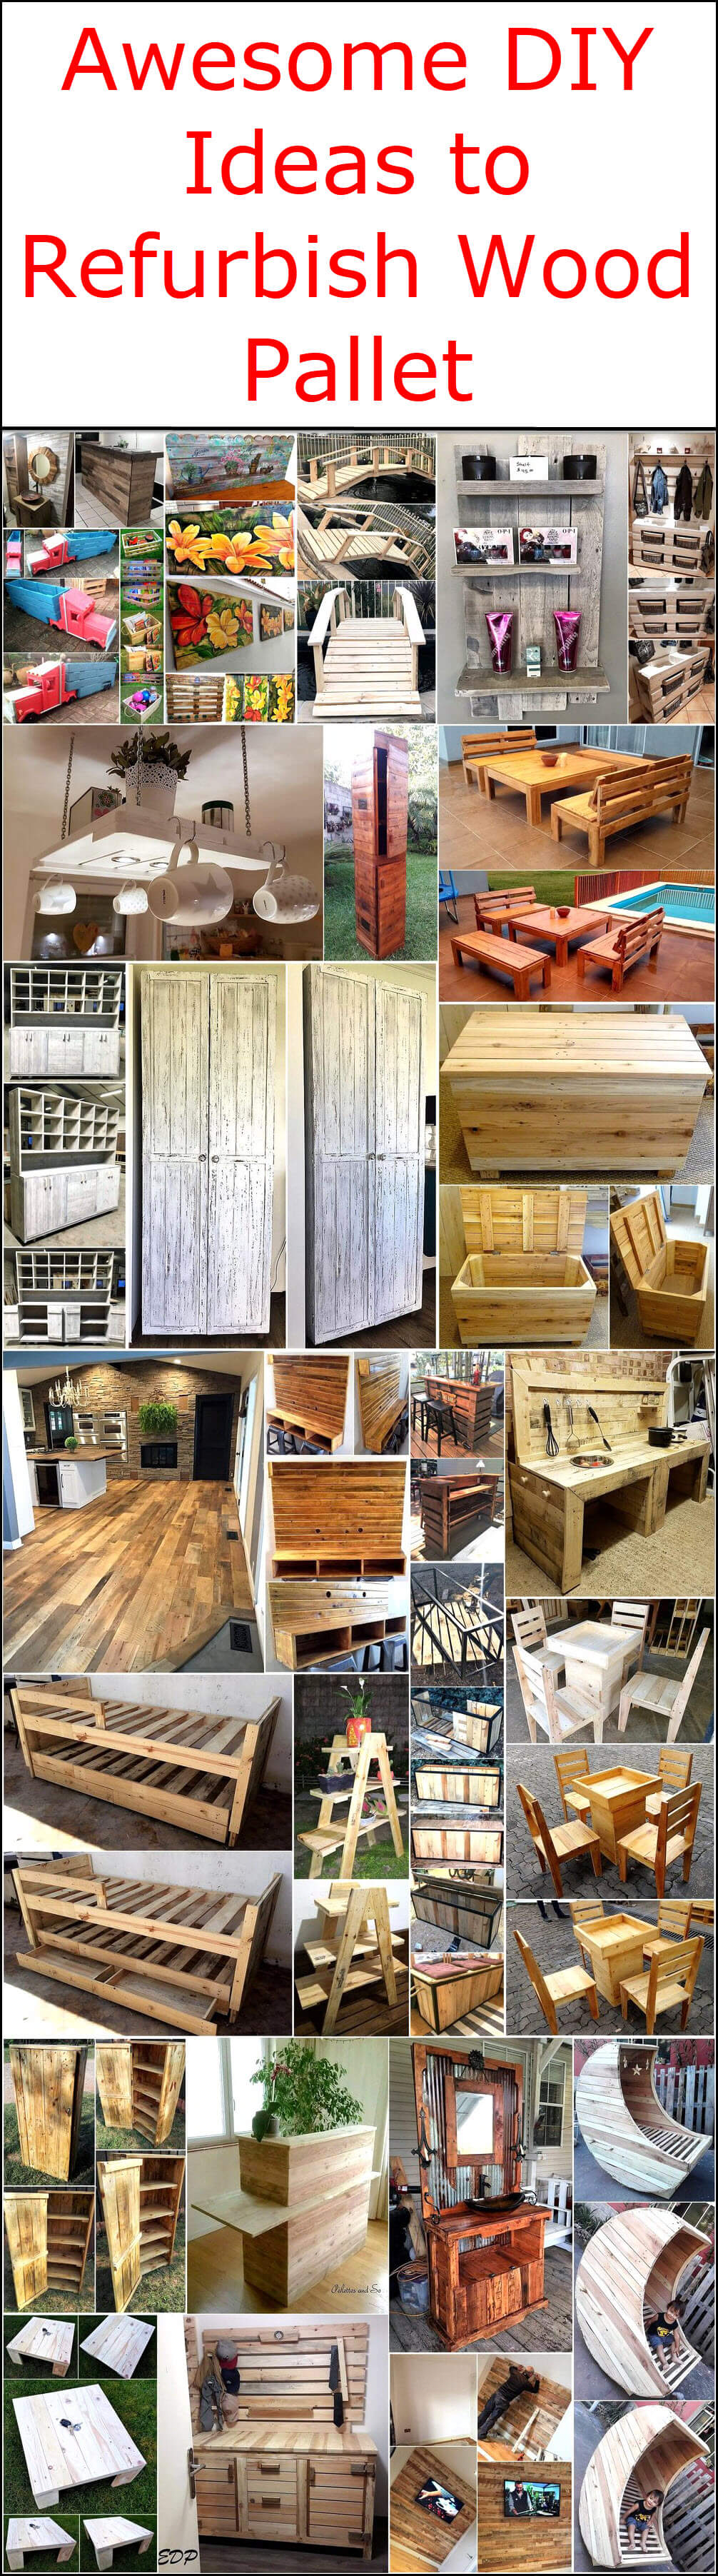 Awesome Diy Ideas To Refurbish Wood Pallet Wood Pallet